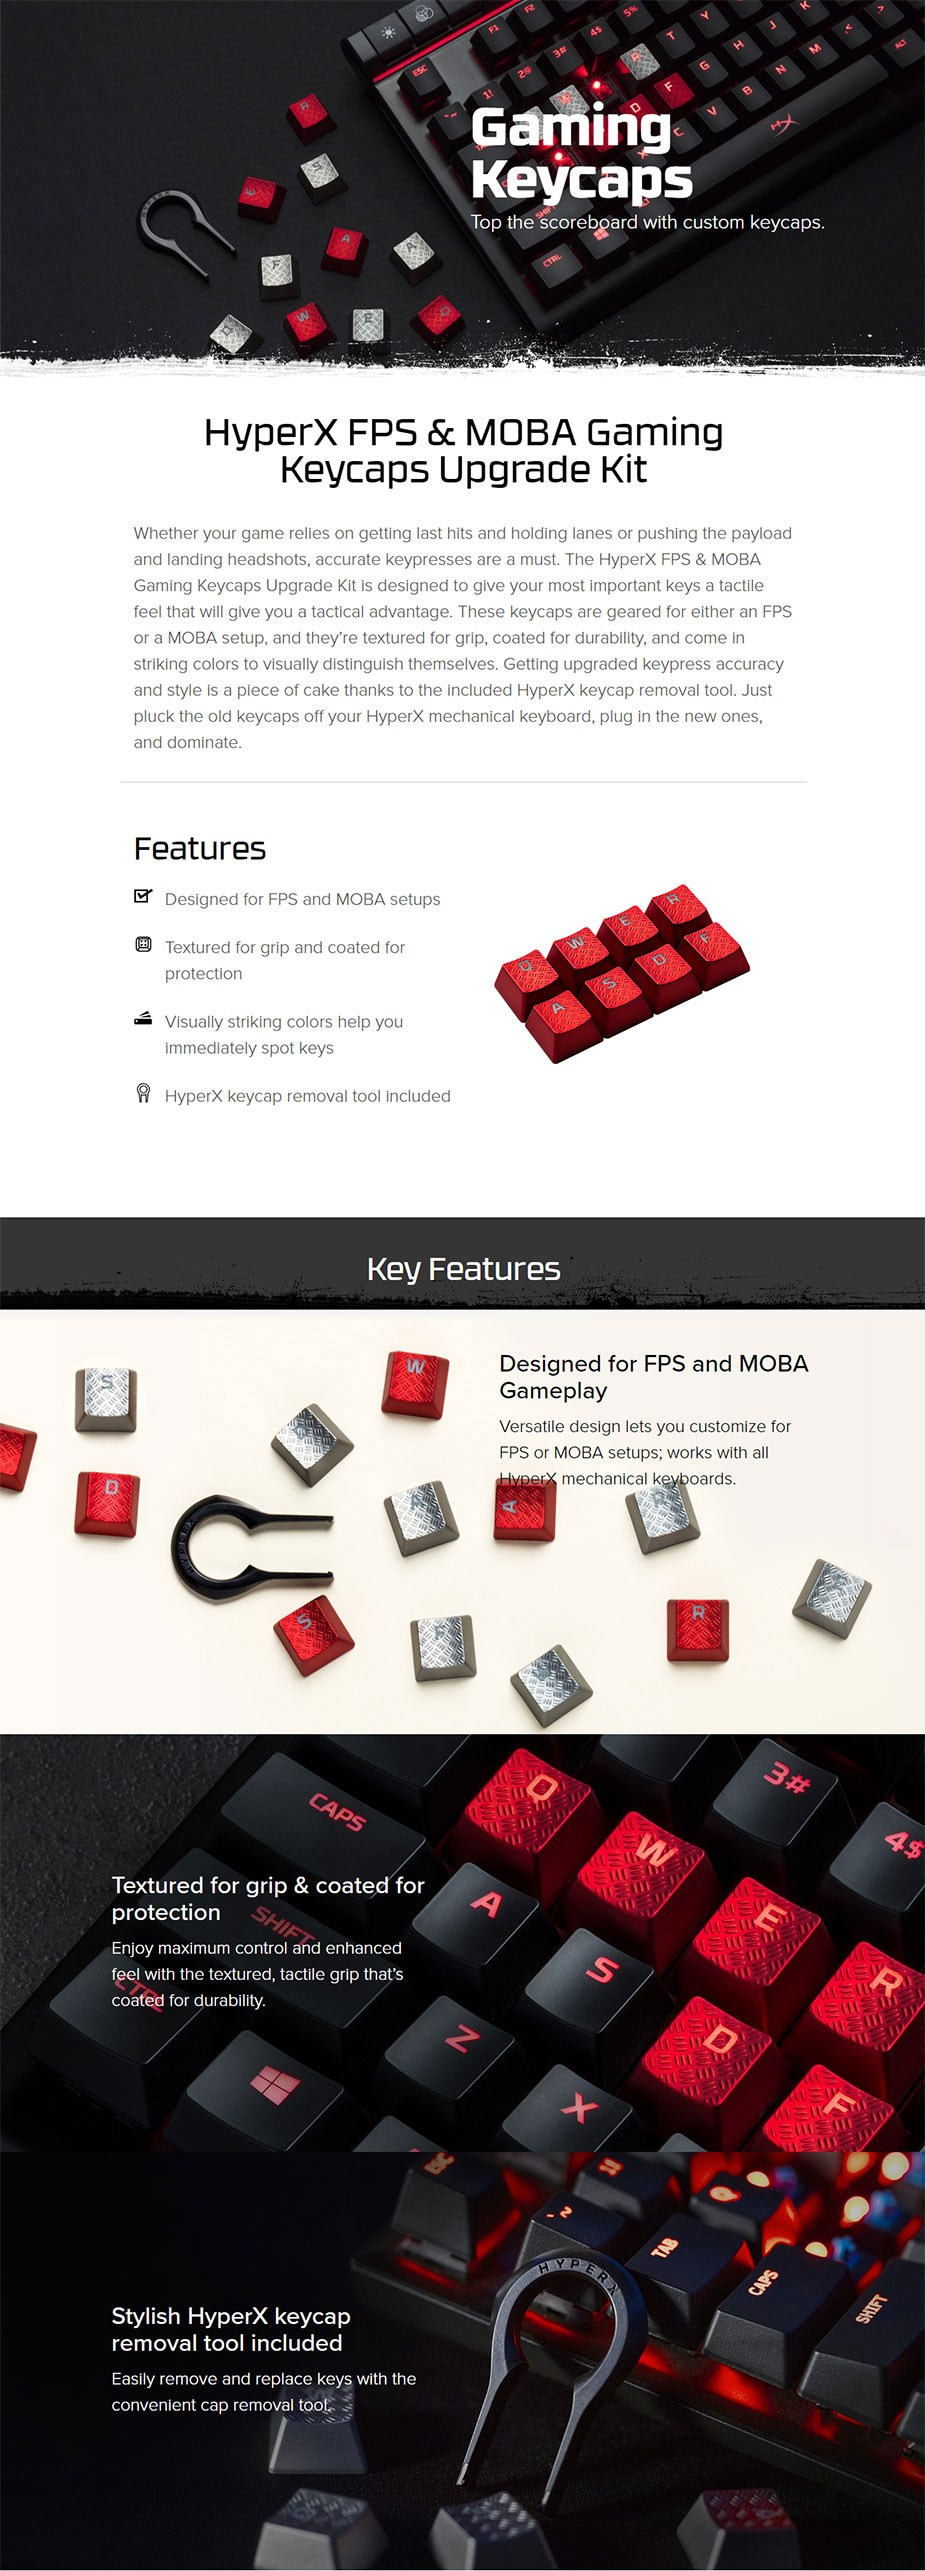 HyperX FPS & MOBA Gaming Keycaps (Red)